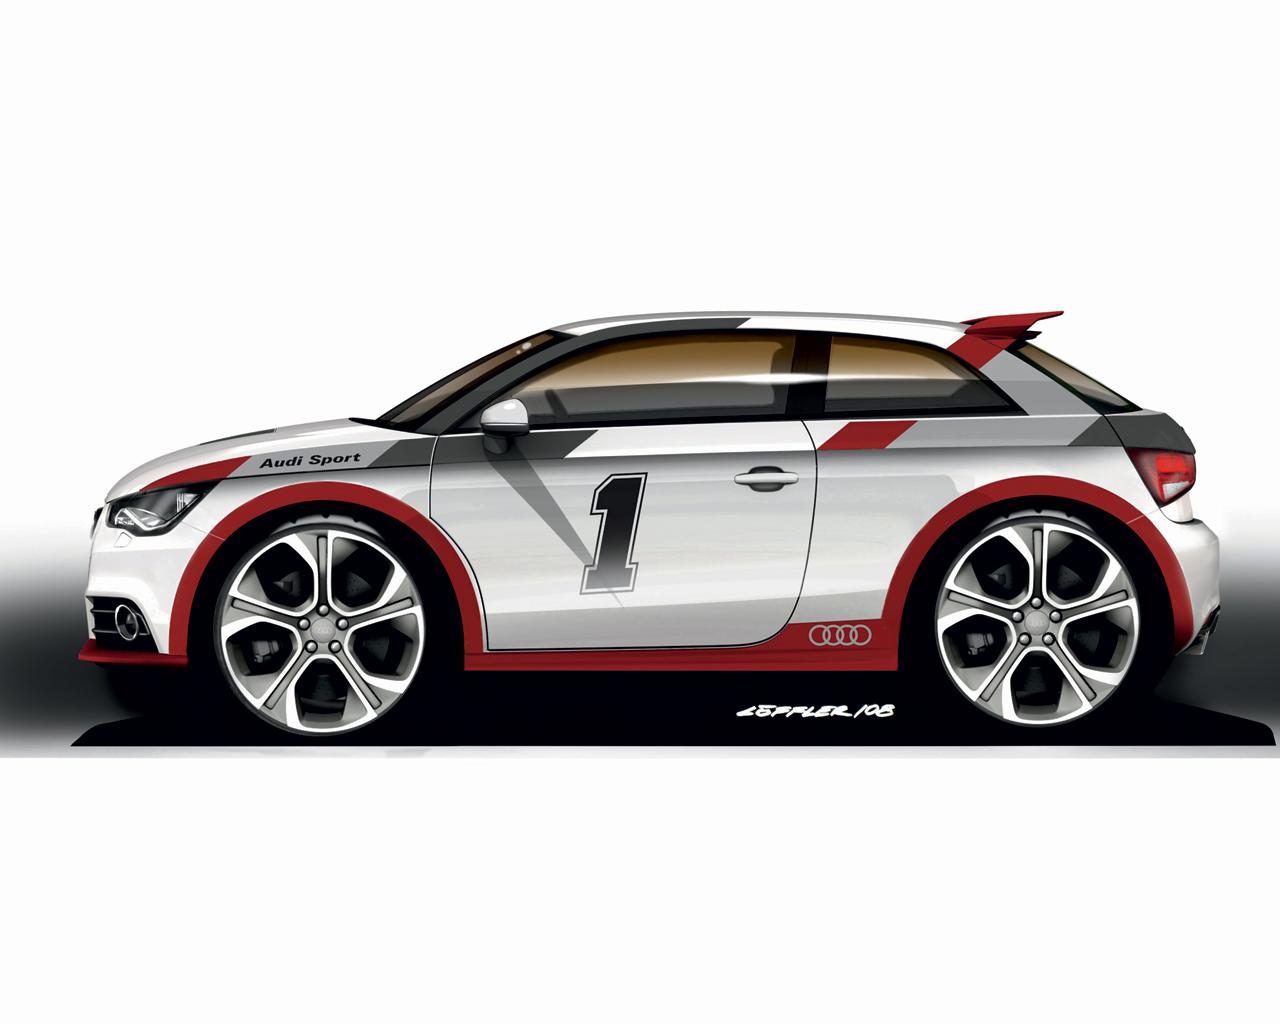 car toon audi a1 sport by p3p70 on deviantart. Black Bedroom Furniture Sets. Home Design Ideas